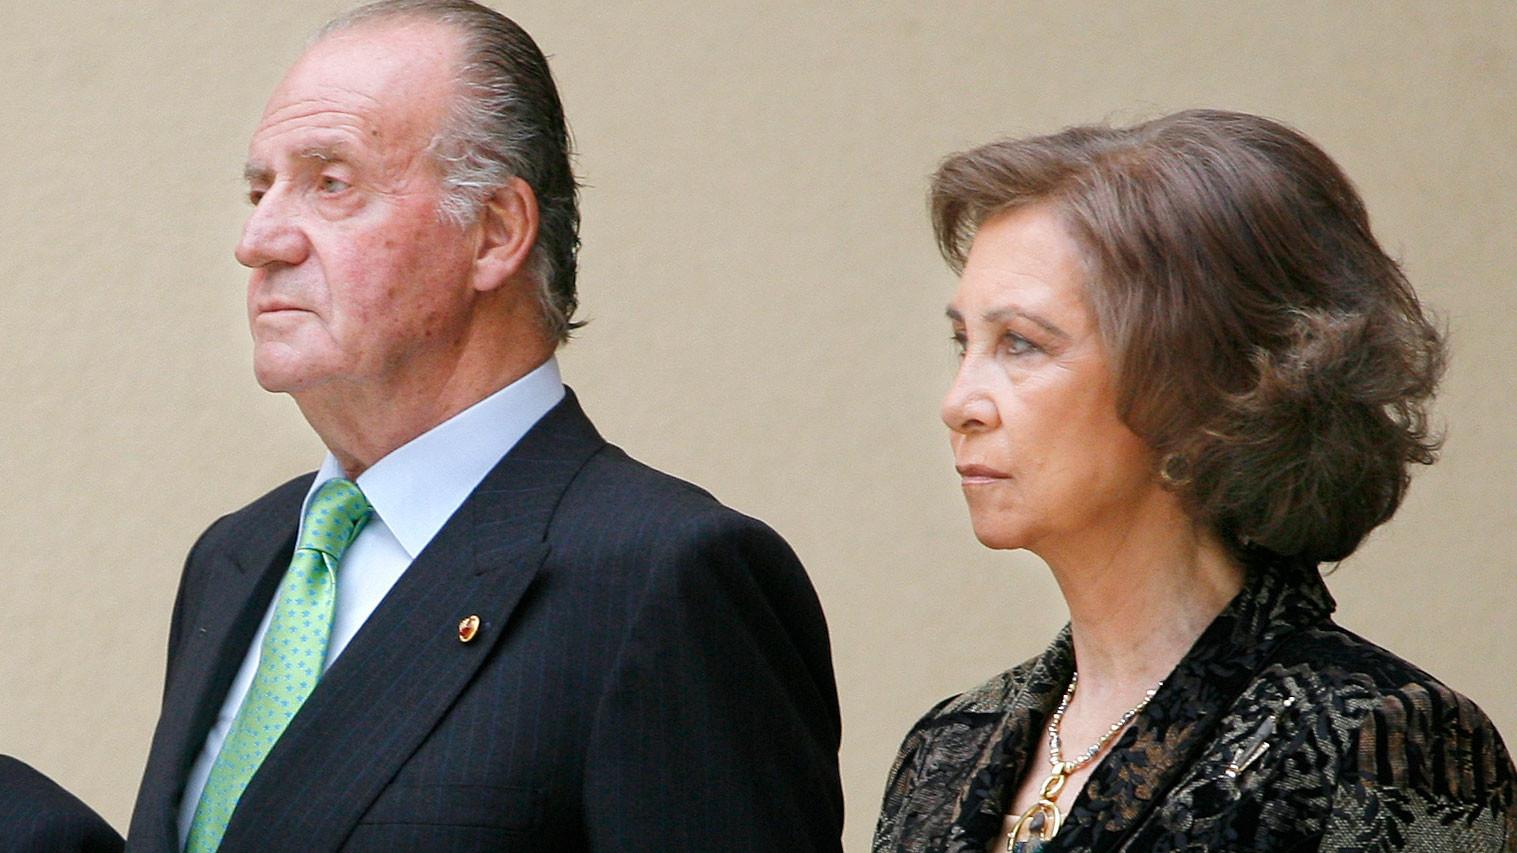 Хуан Карлос I де Бурбон и королева София. Фото: © AP Photo/Daniel Ochoa de Olza